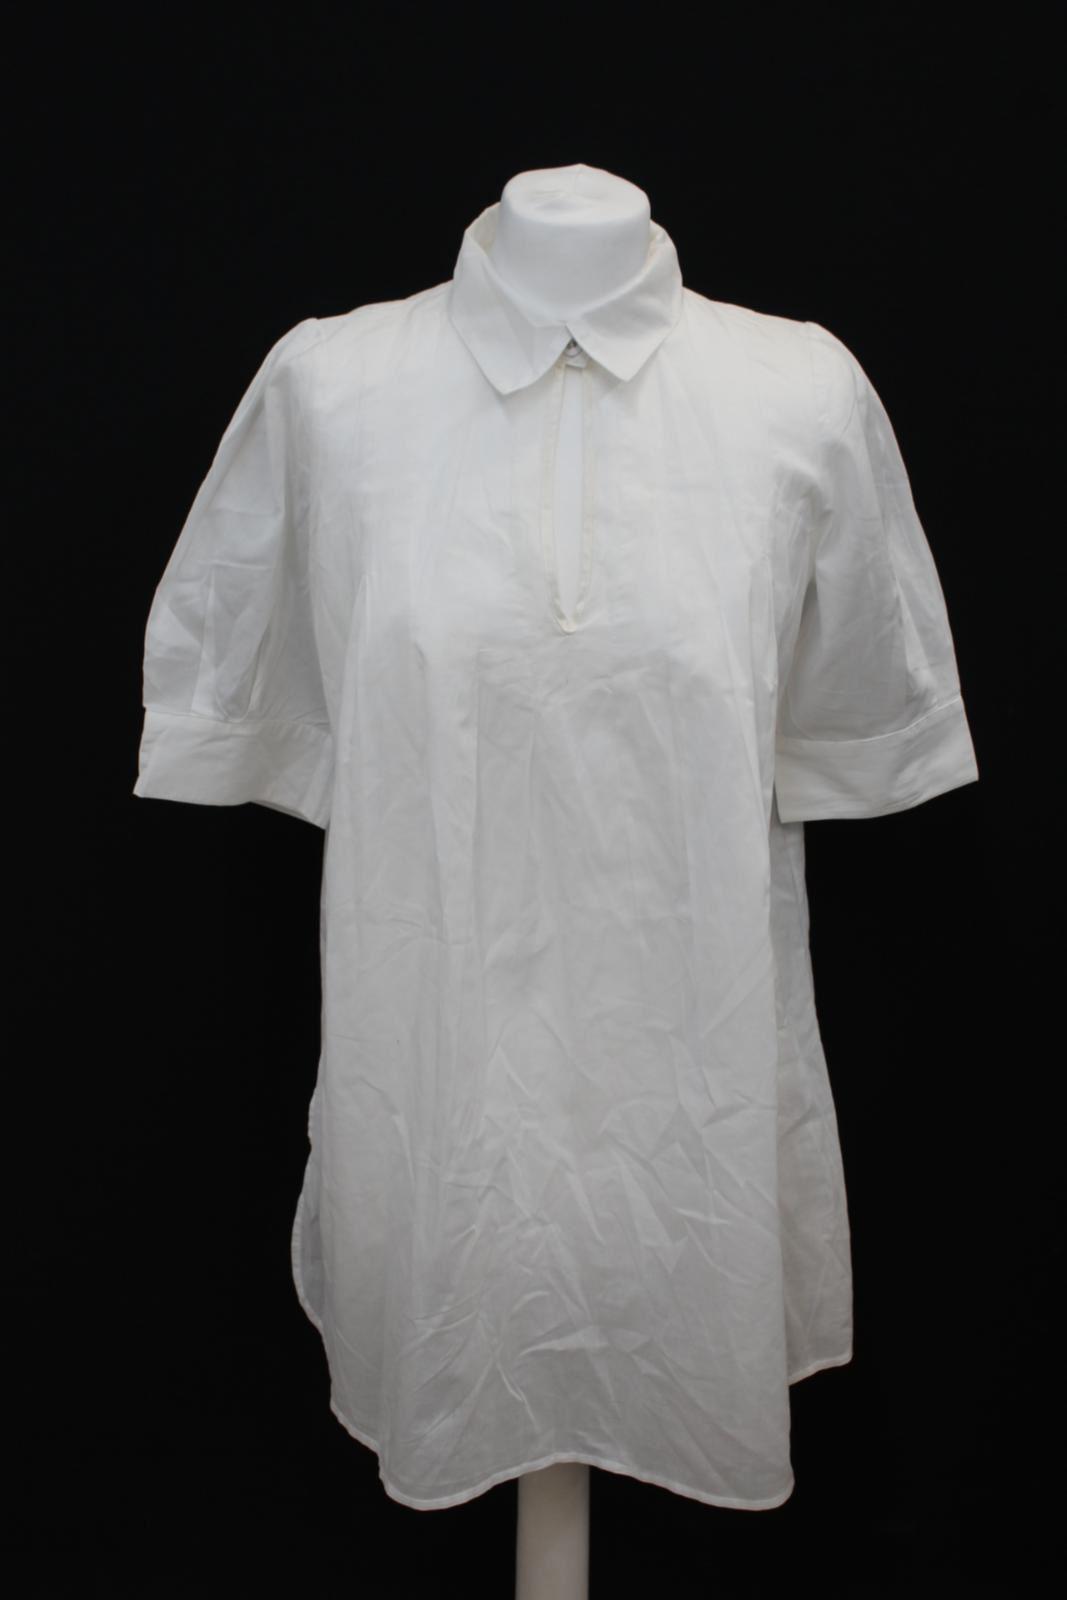 BRUUNS BAZAAR Ladies Weiß 1Cotton Collarot Keyhole Collar Blouse Top EU38 UK12